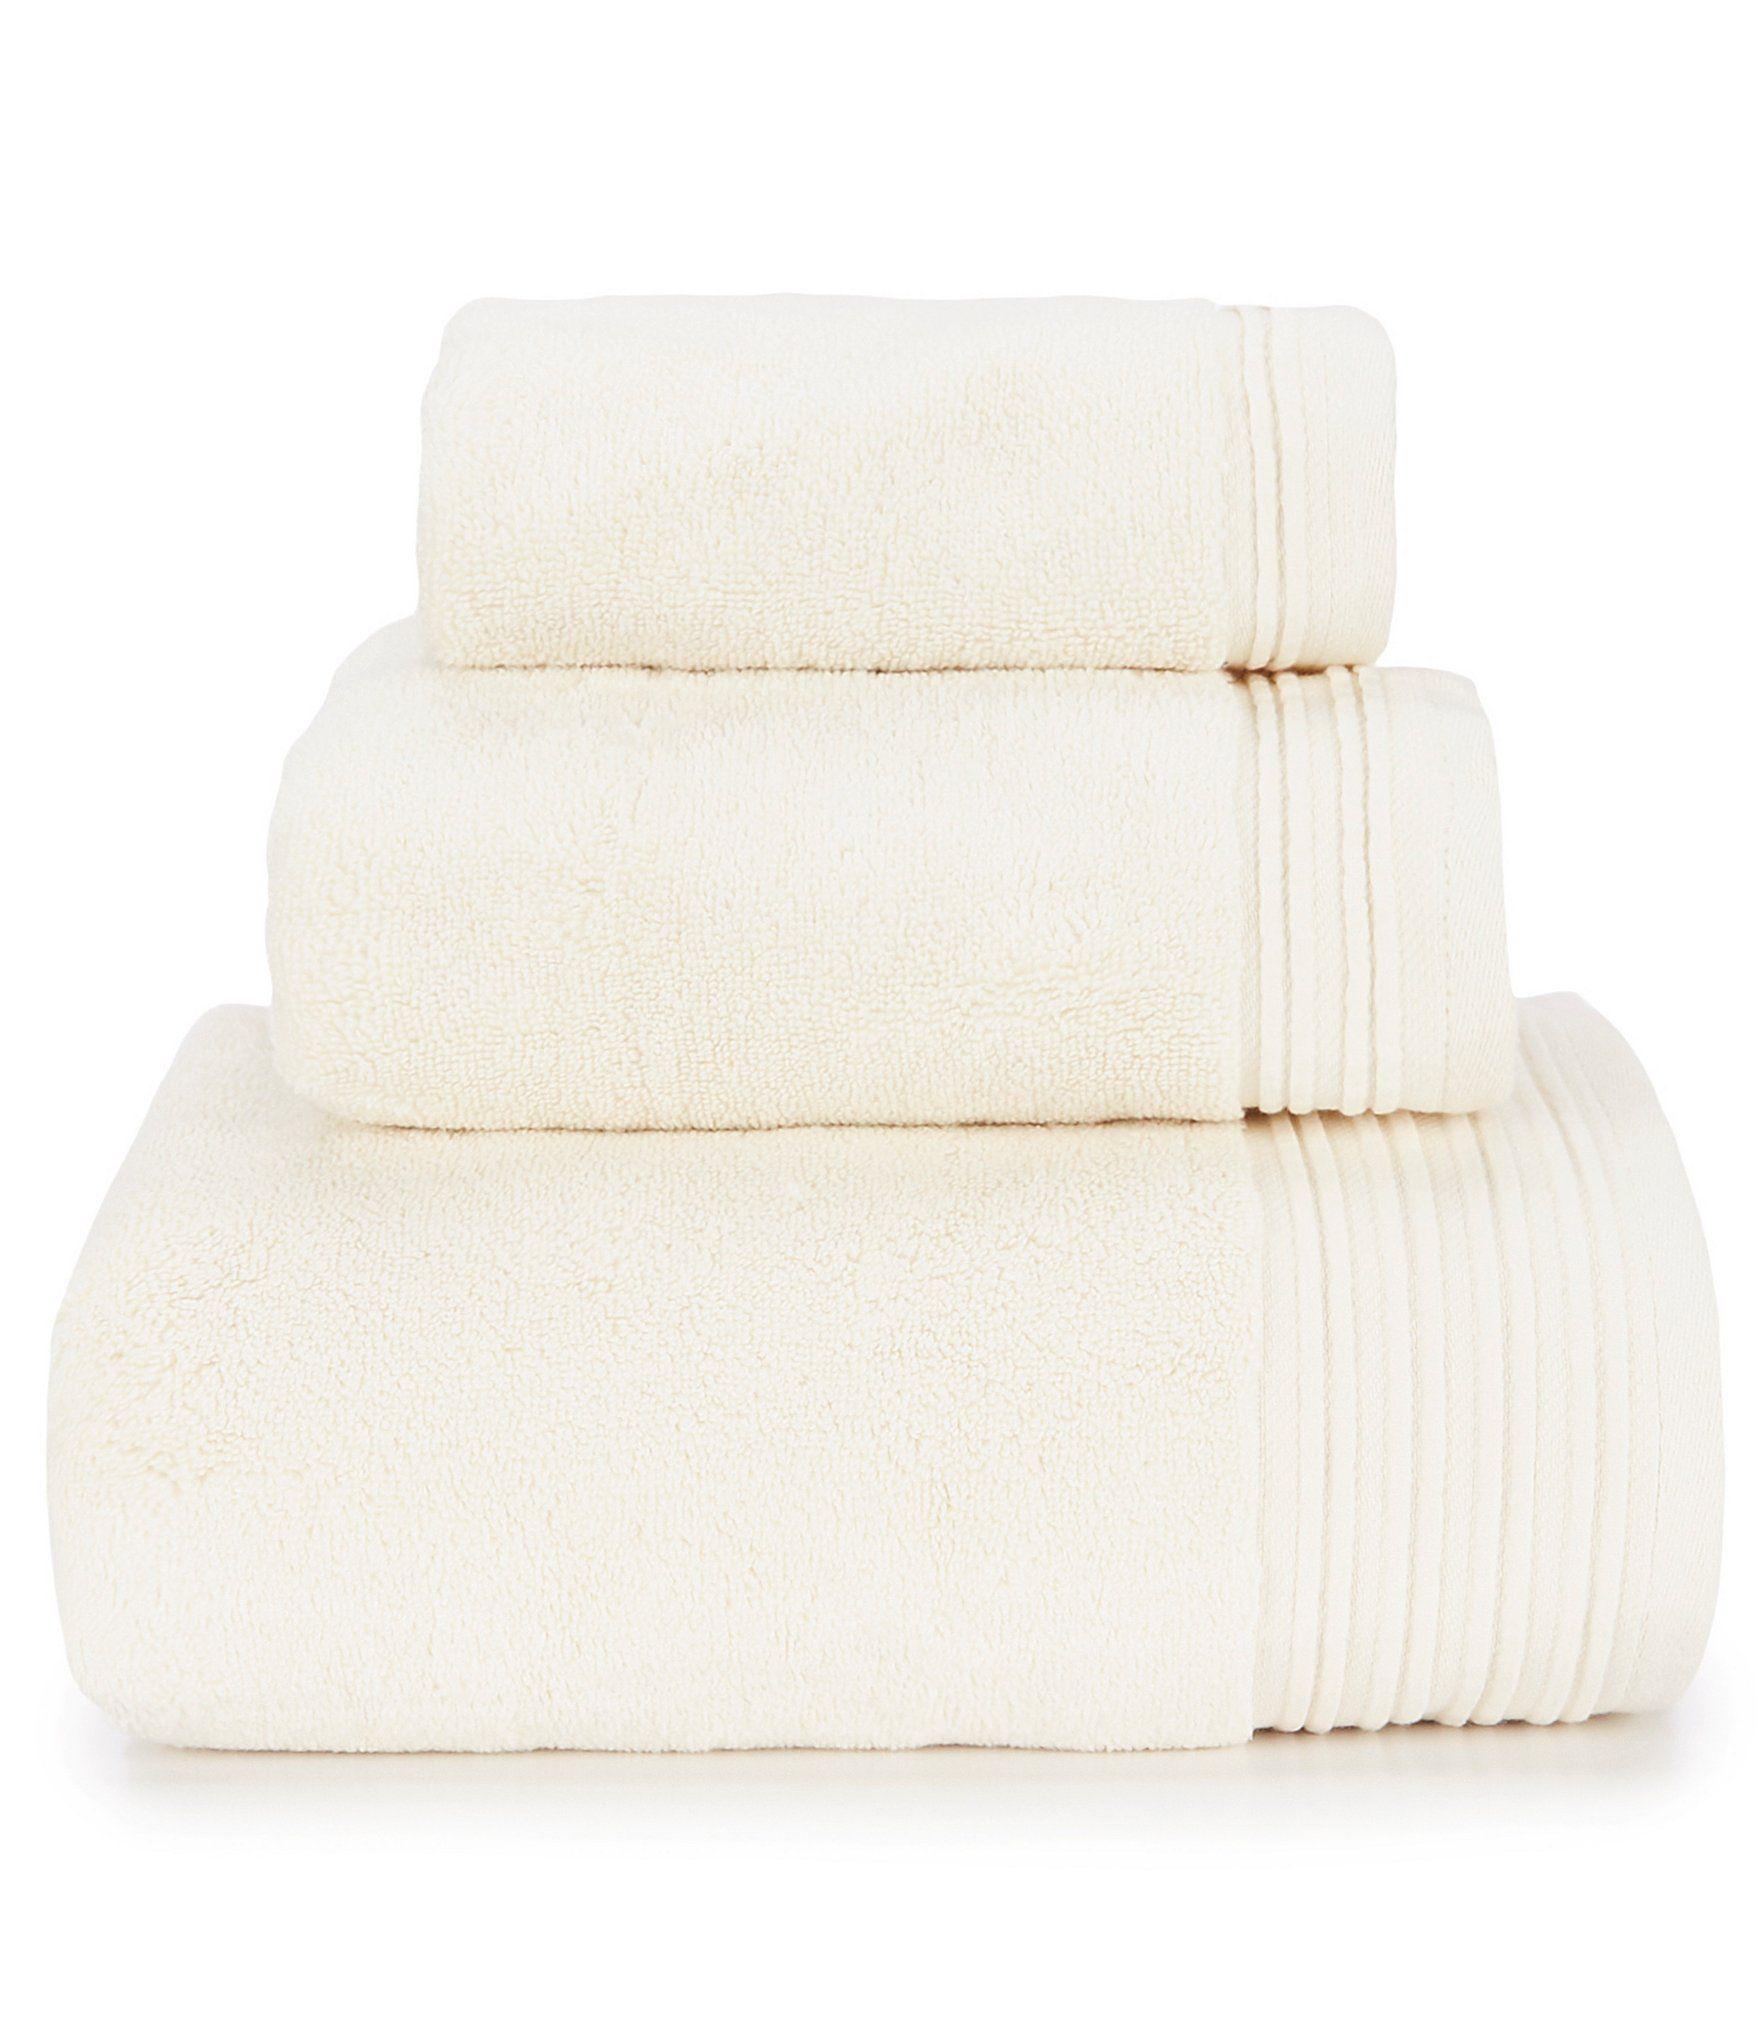 kate spade new york Scallop Bath Towel | Dillard's #handtowels